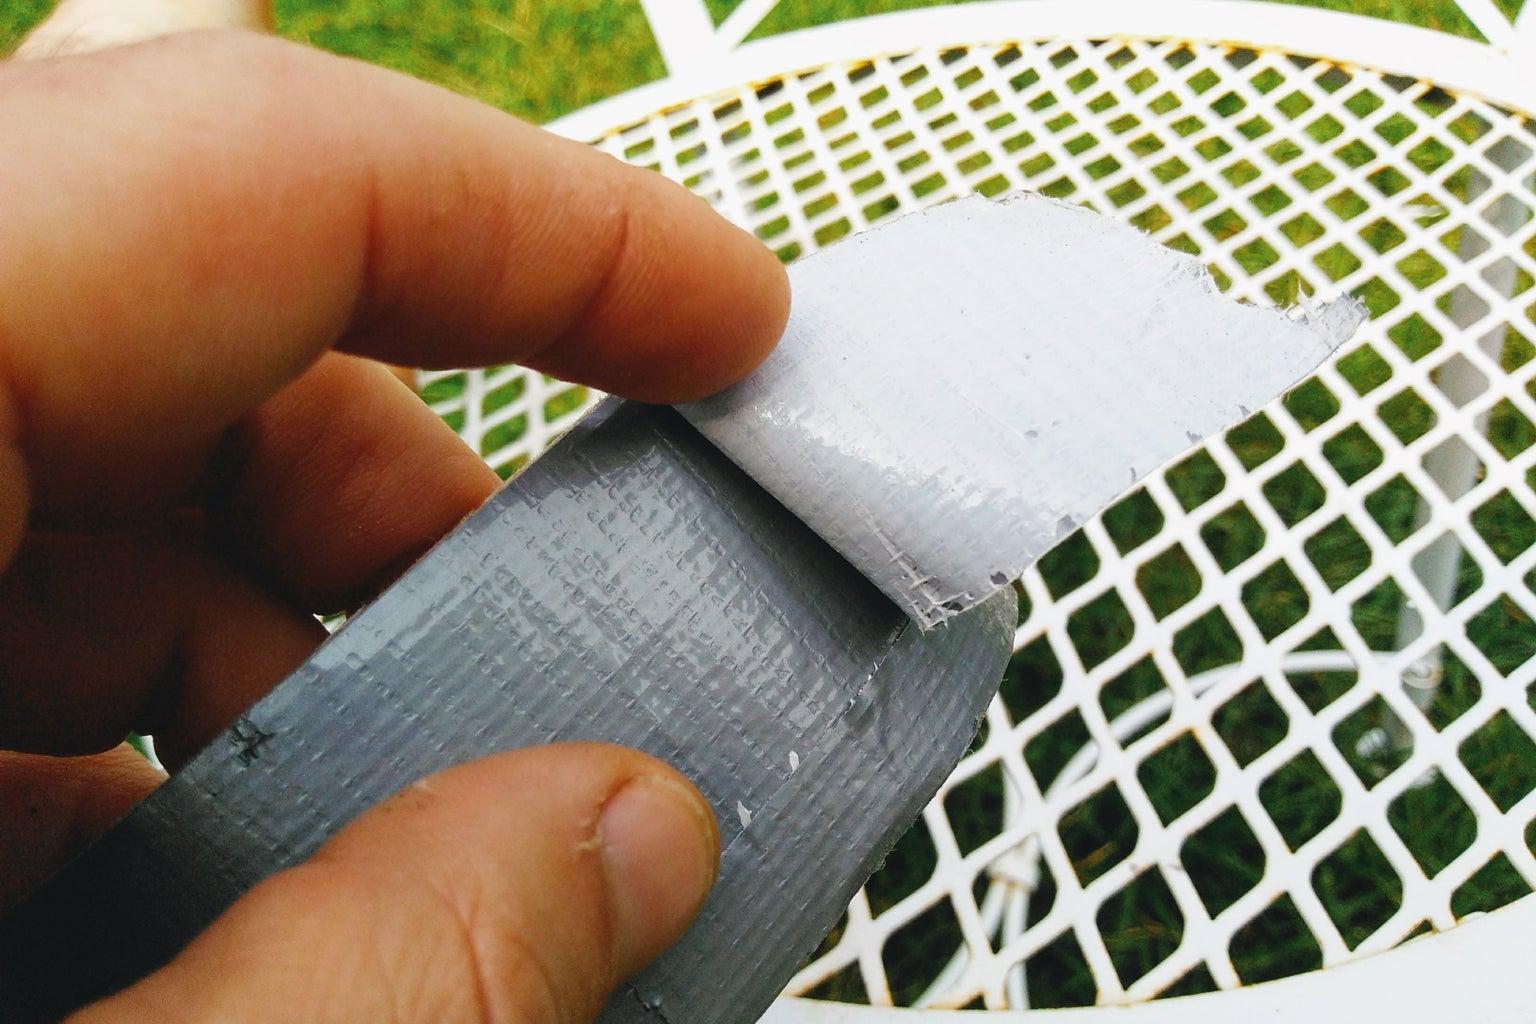 Bandage Preparation - Cutting Tape